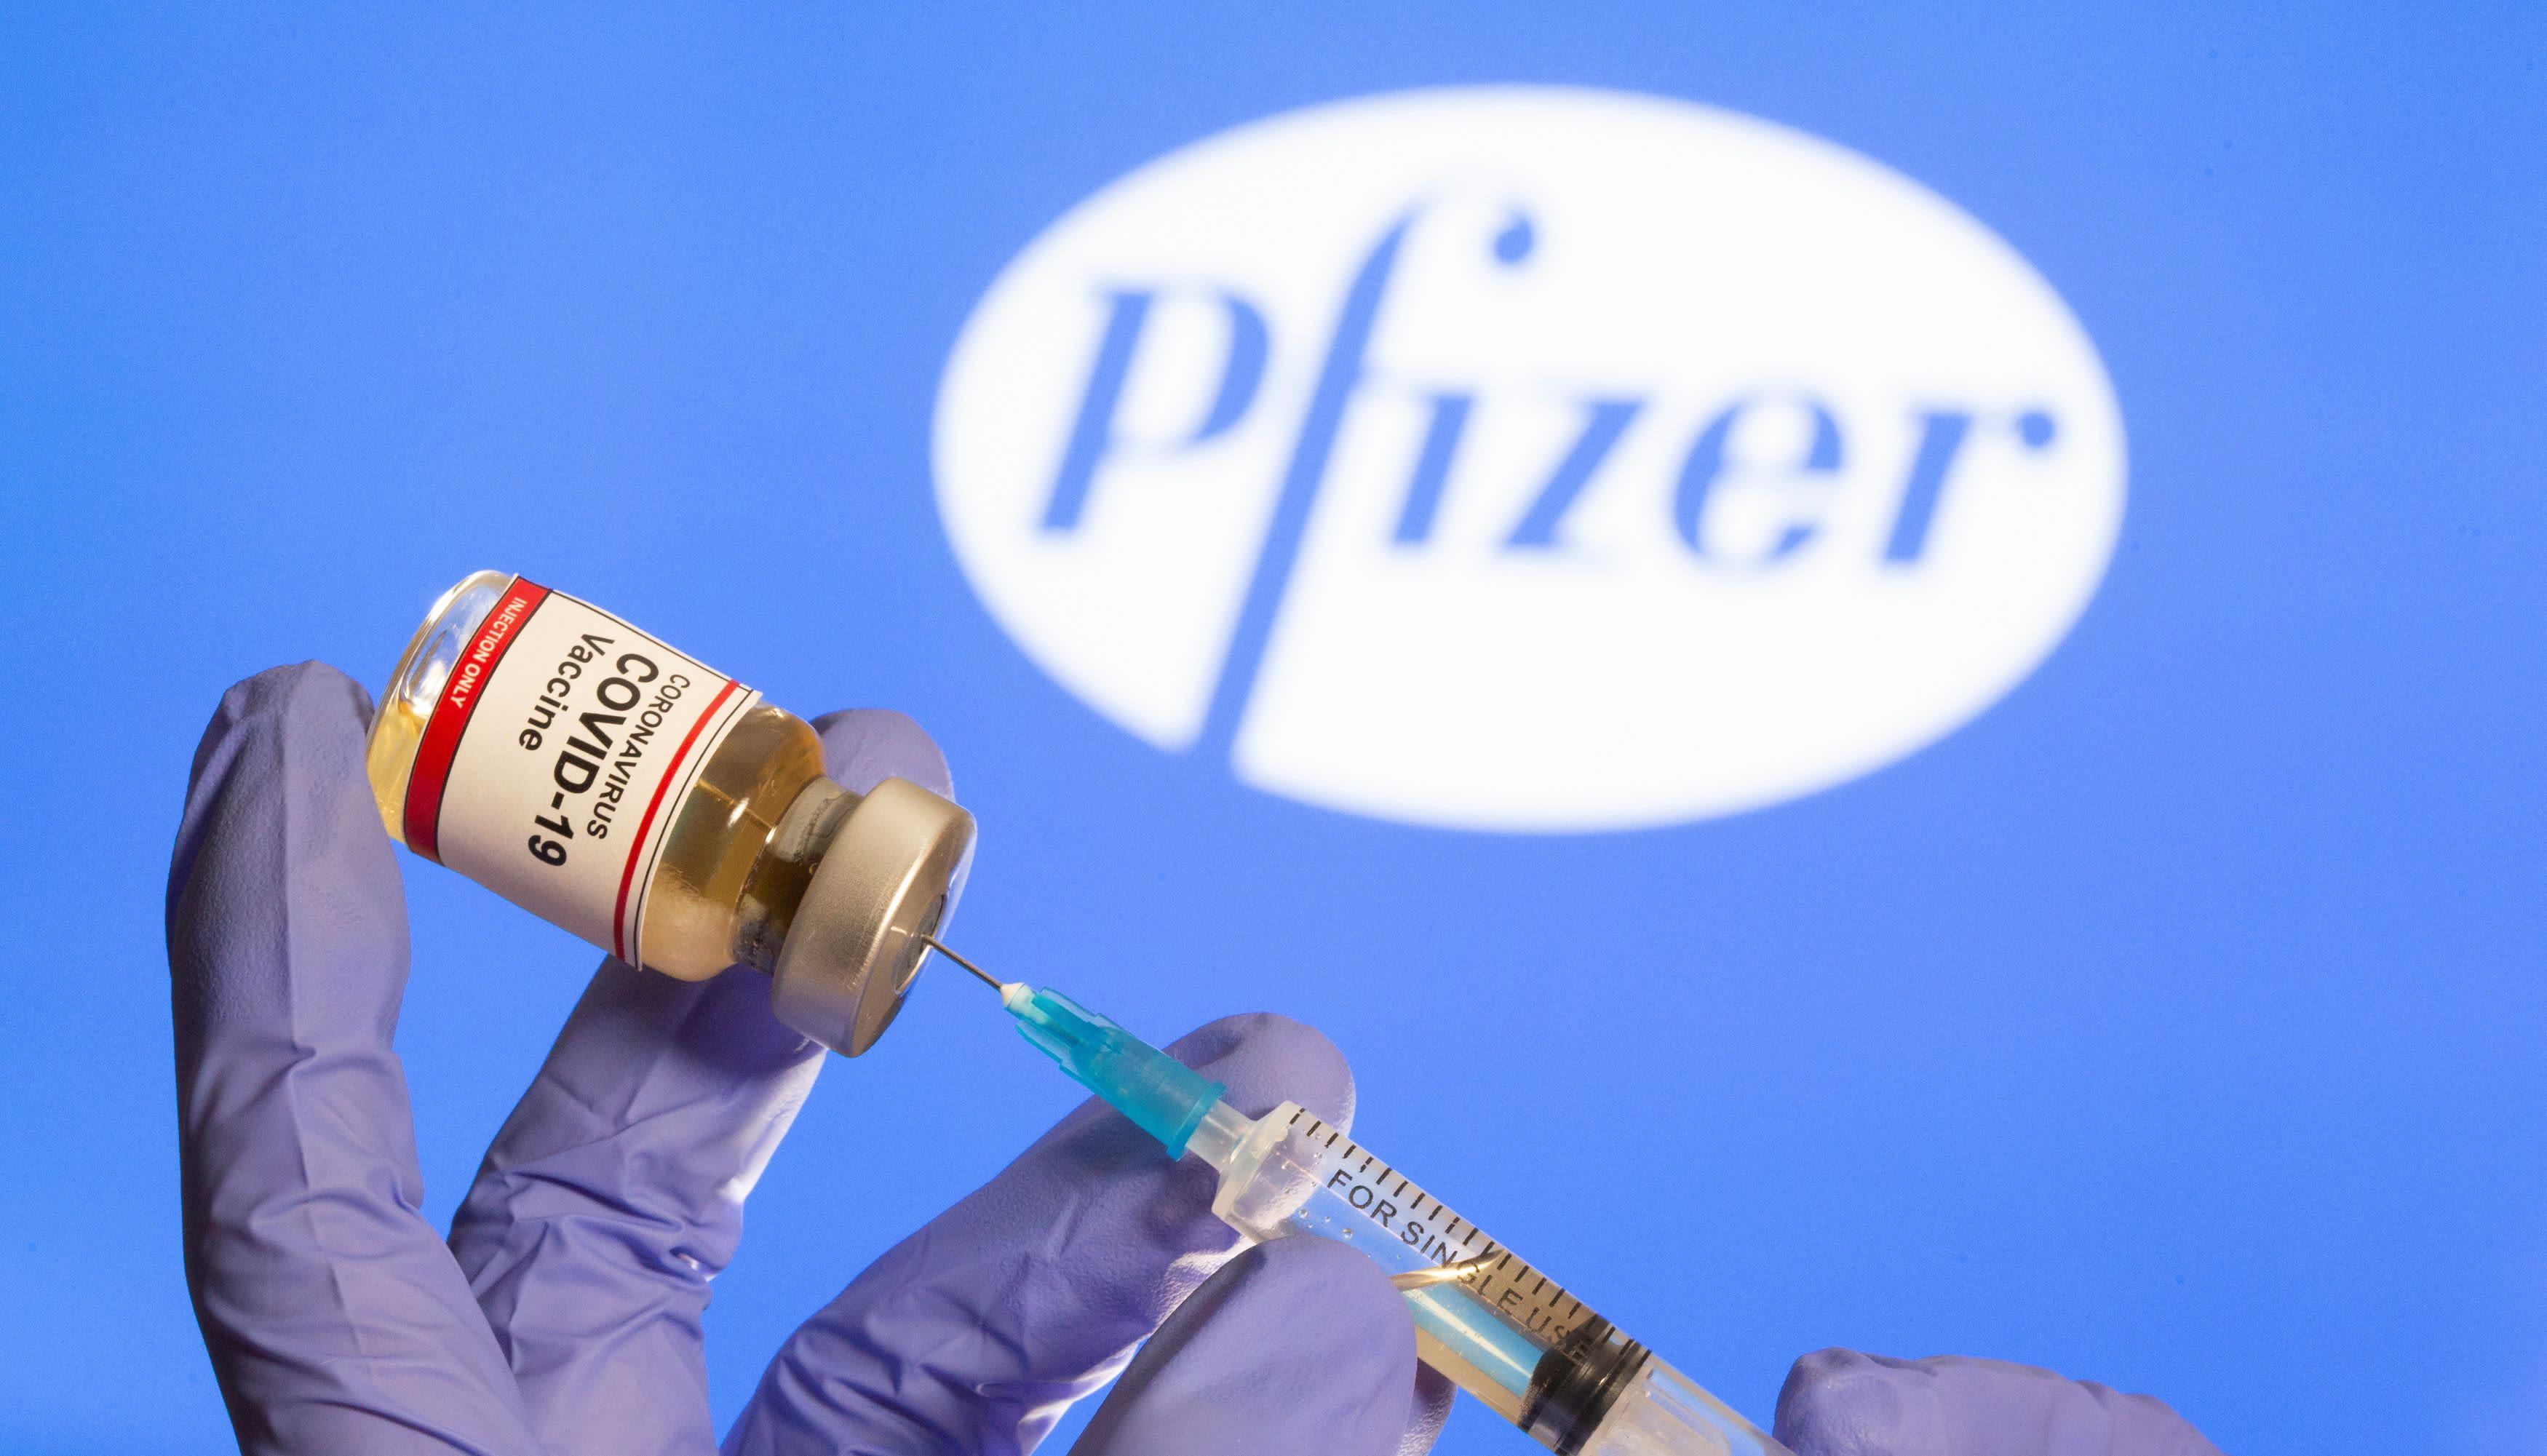 Kids aged 12 above will receive Pfizer.